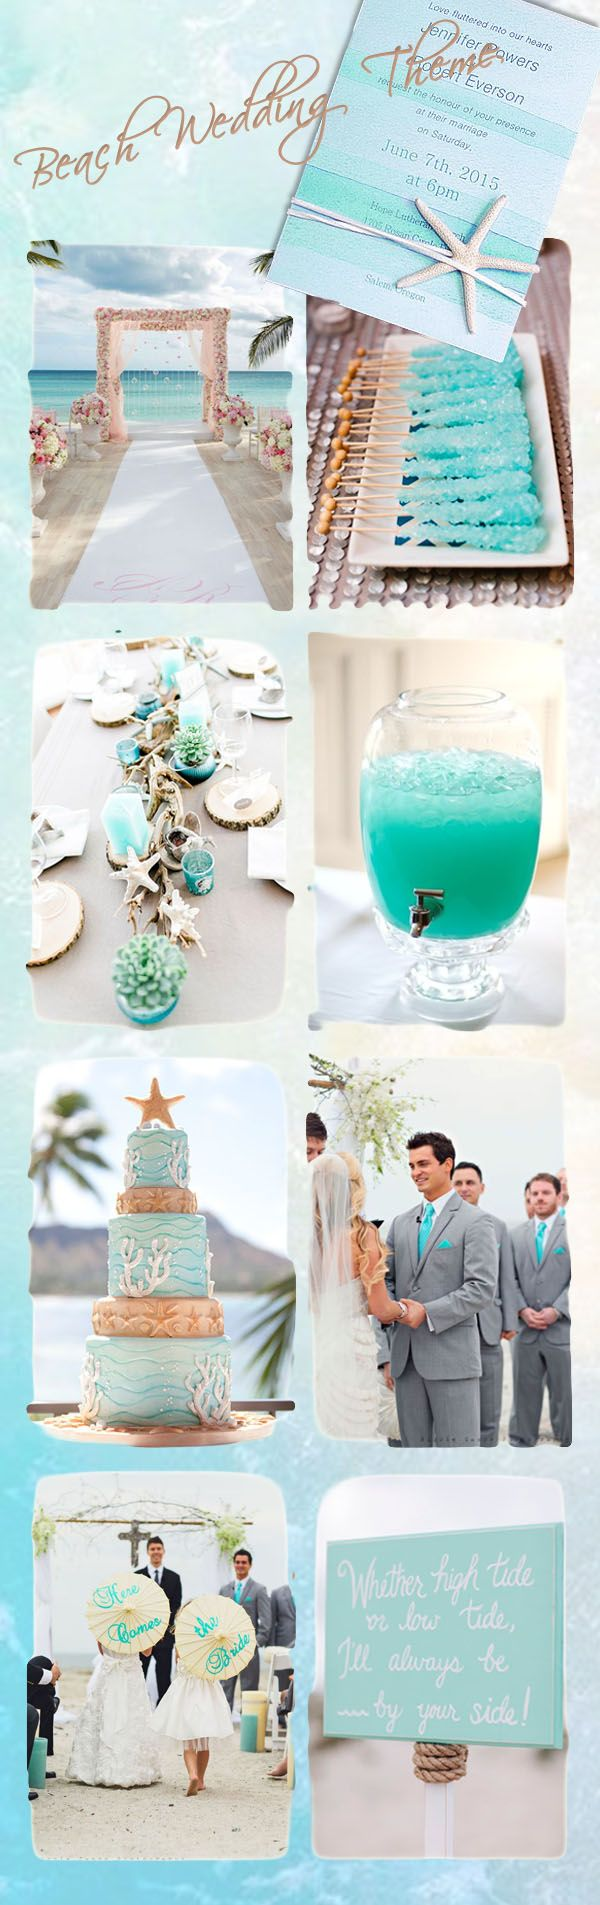 Wedding decoration ideas beach theme  Top Ten Wedding Theme Ideas With Beautiful InvitationsPart One